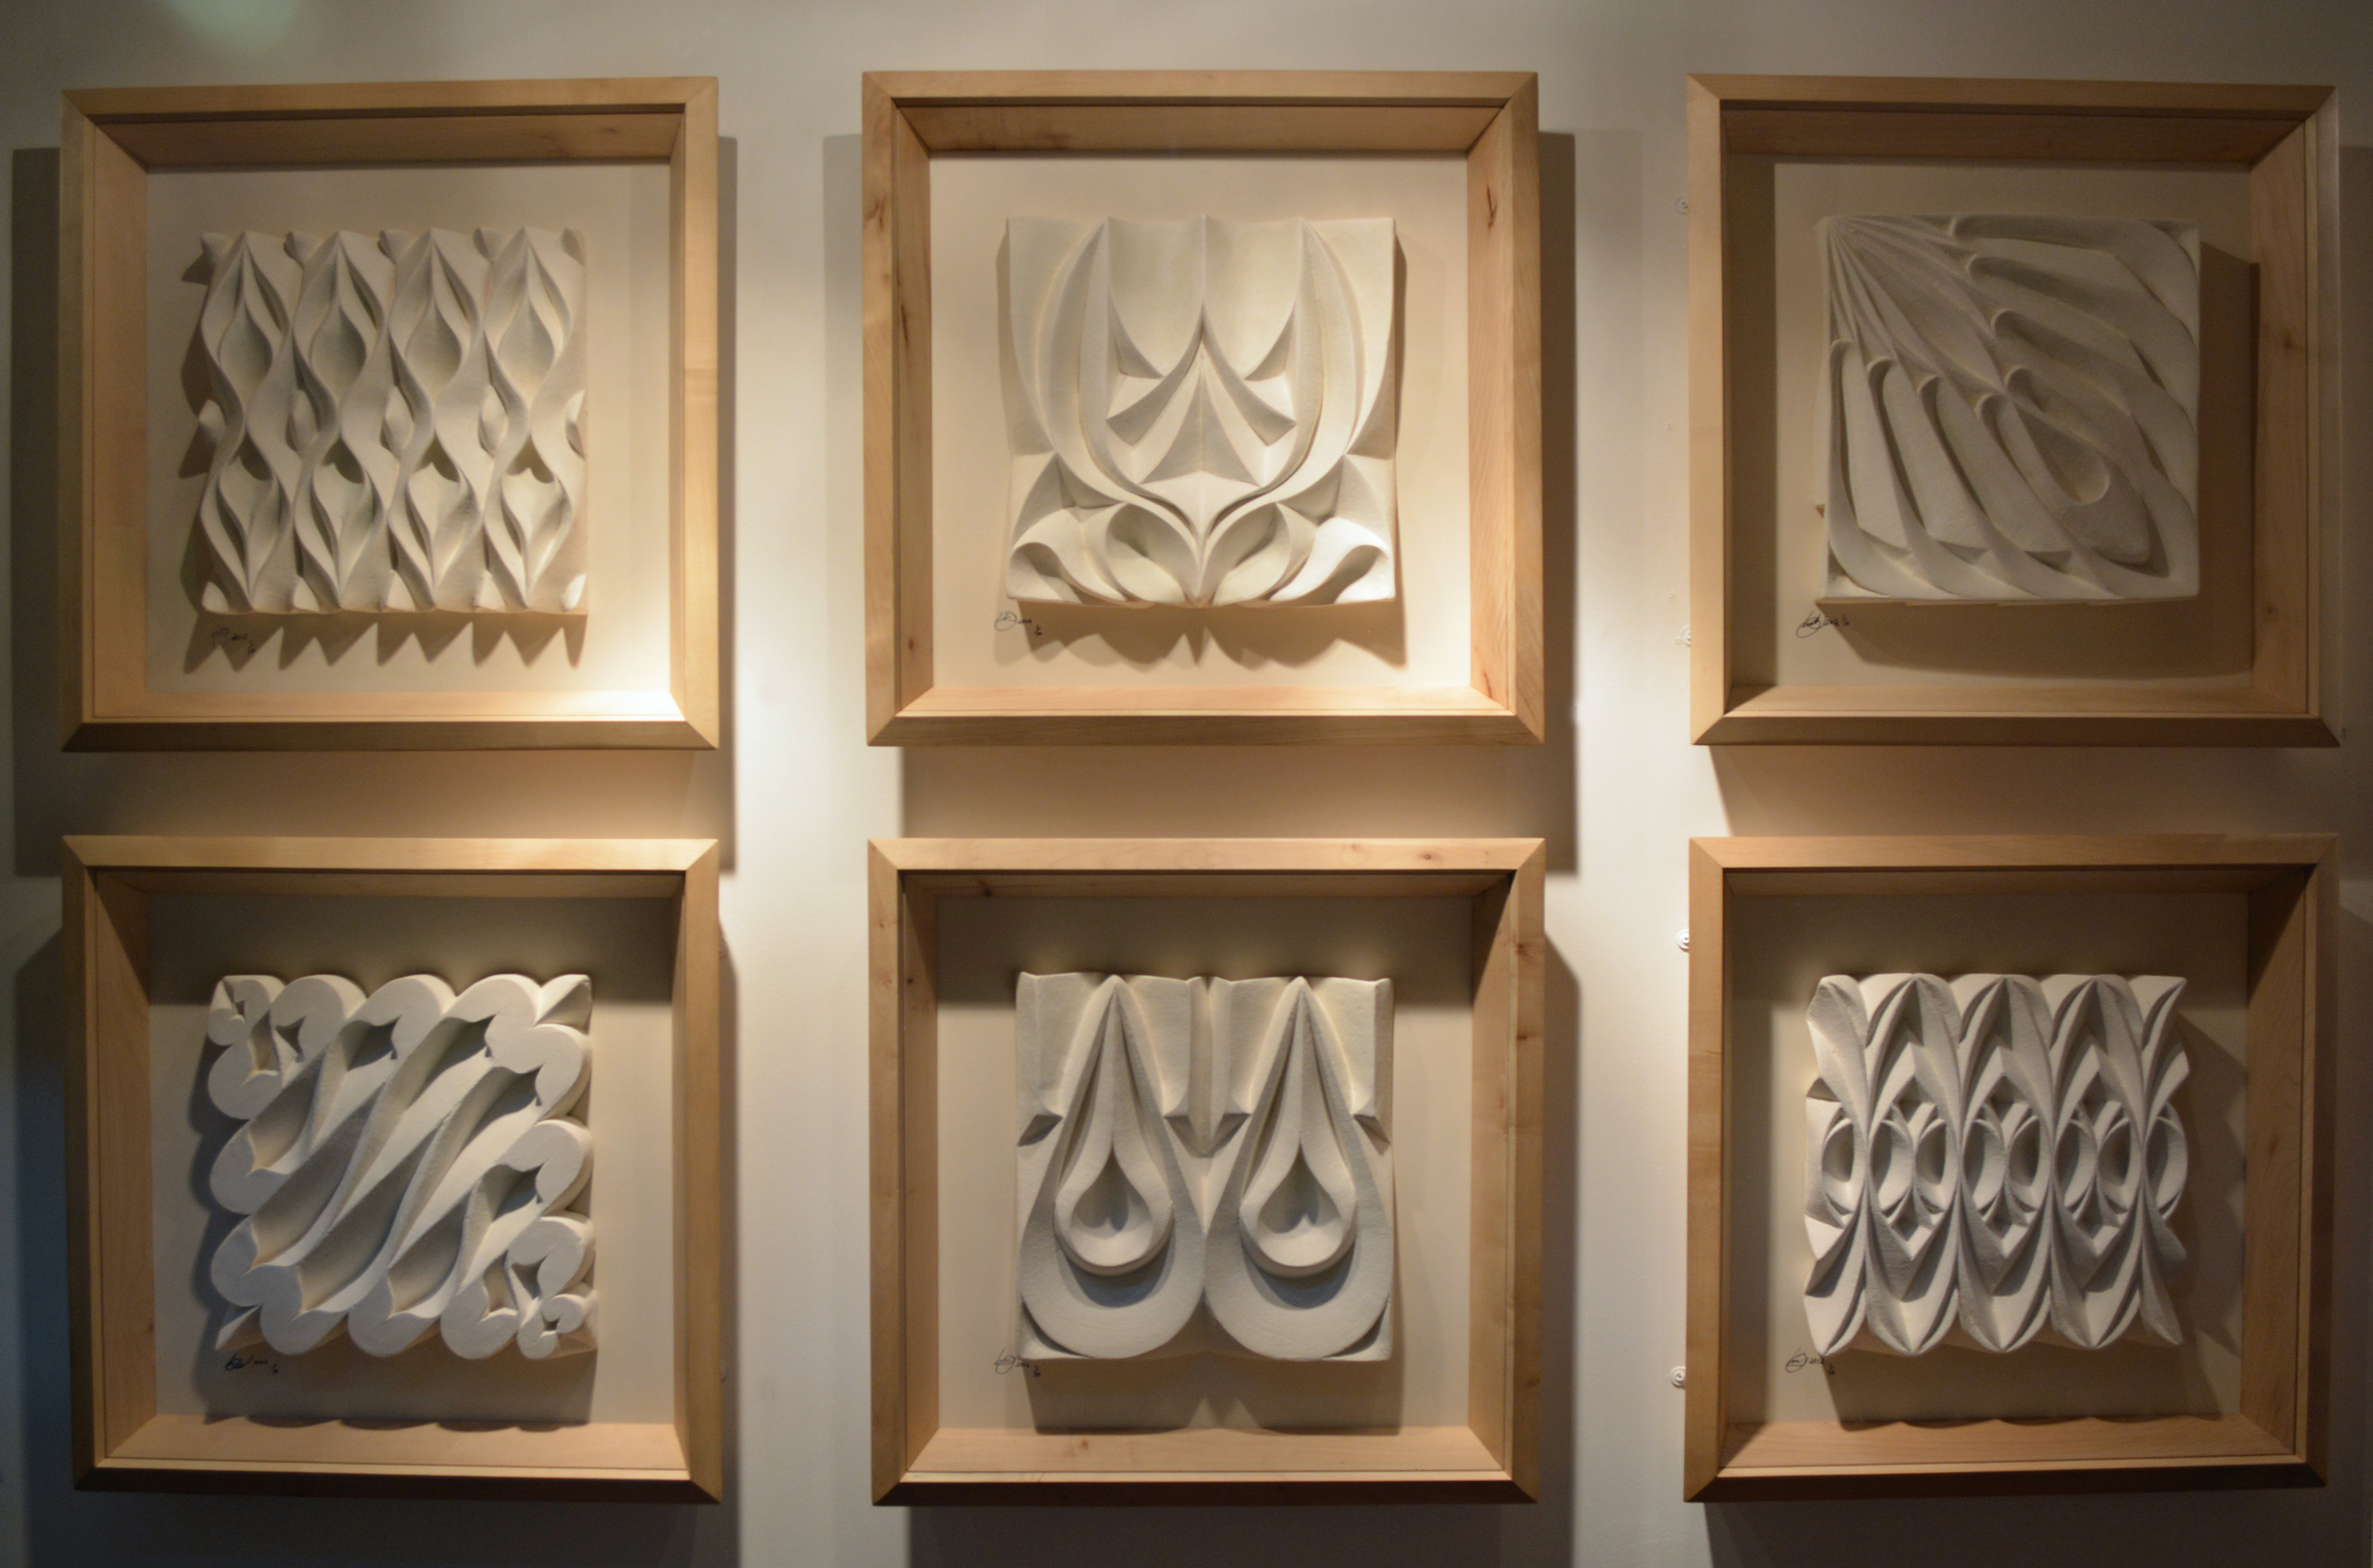 Framed Sculpted Tiles